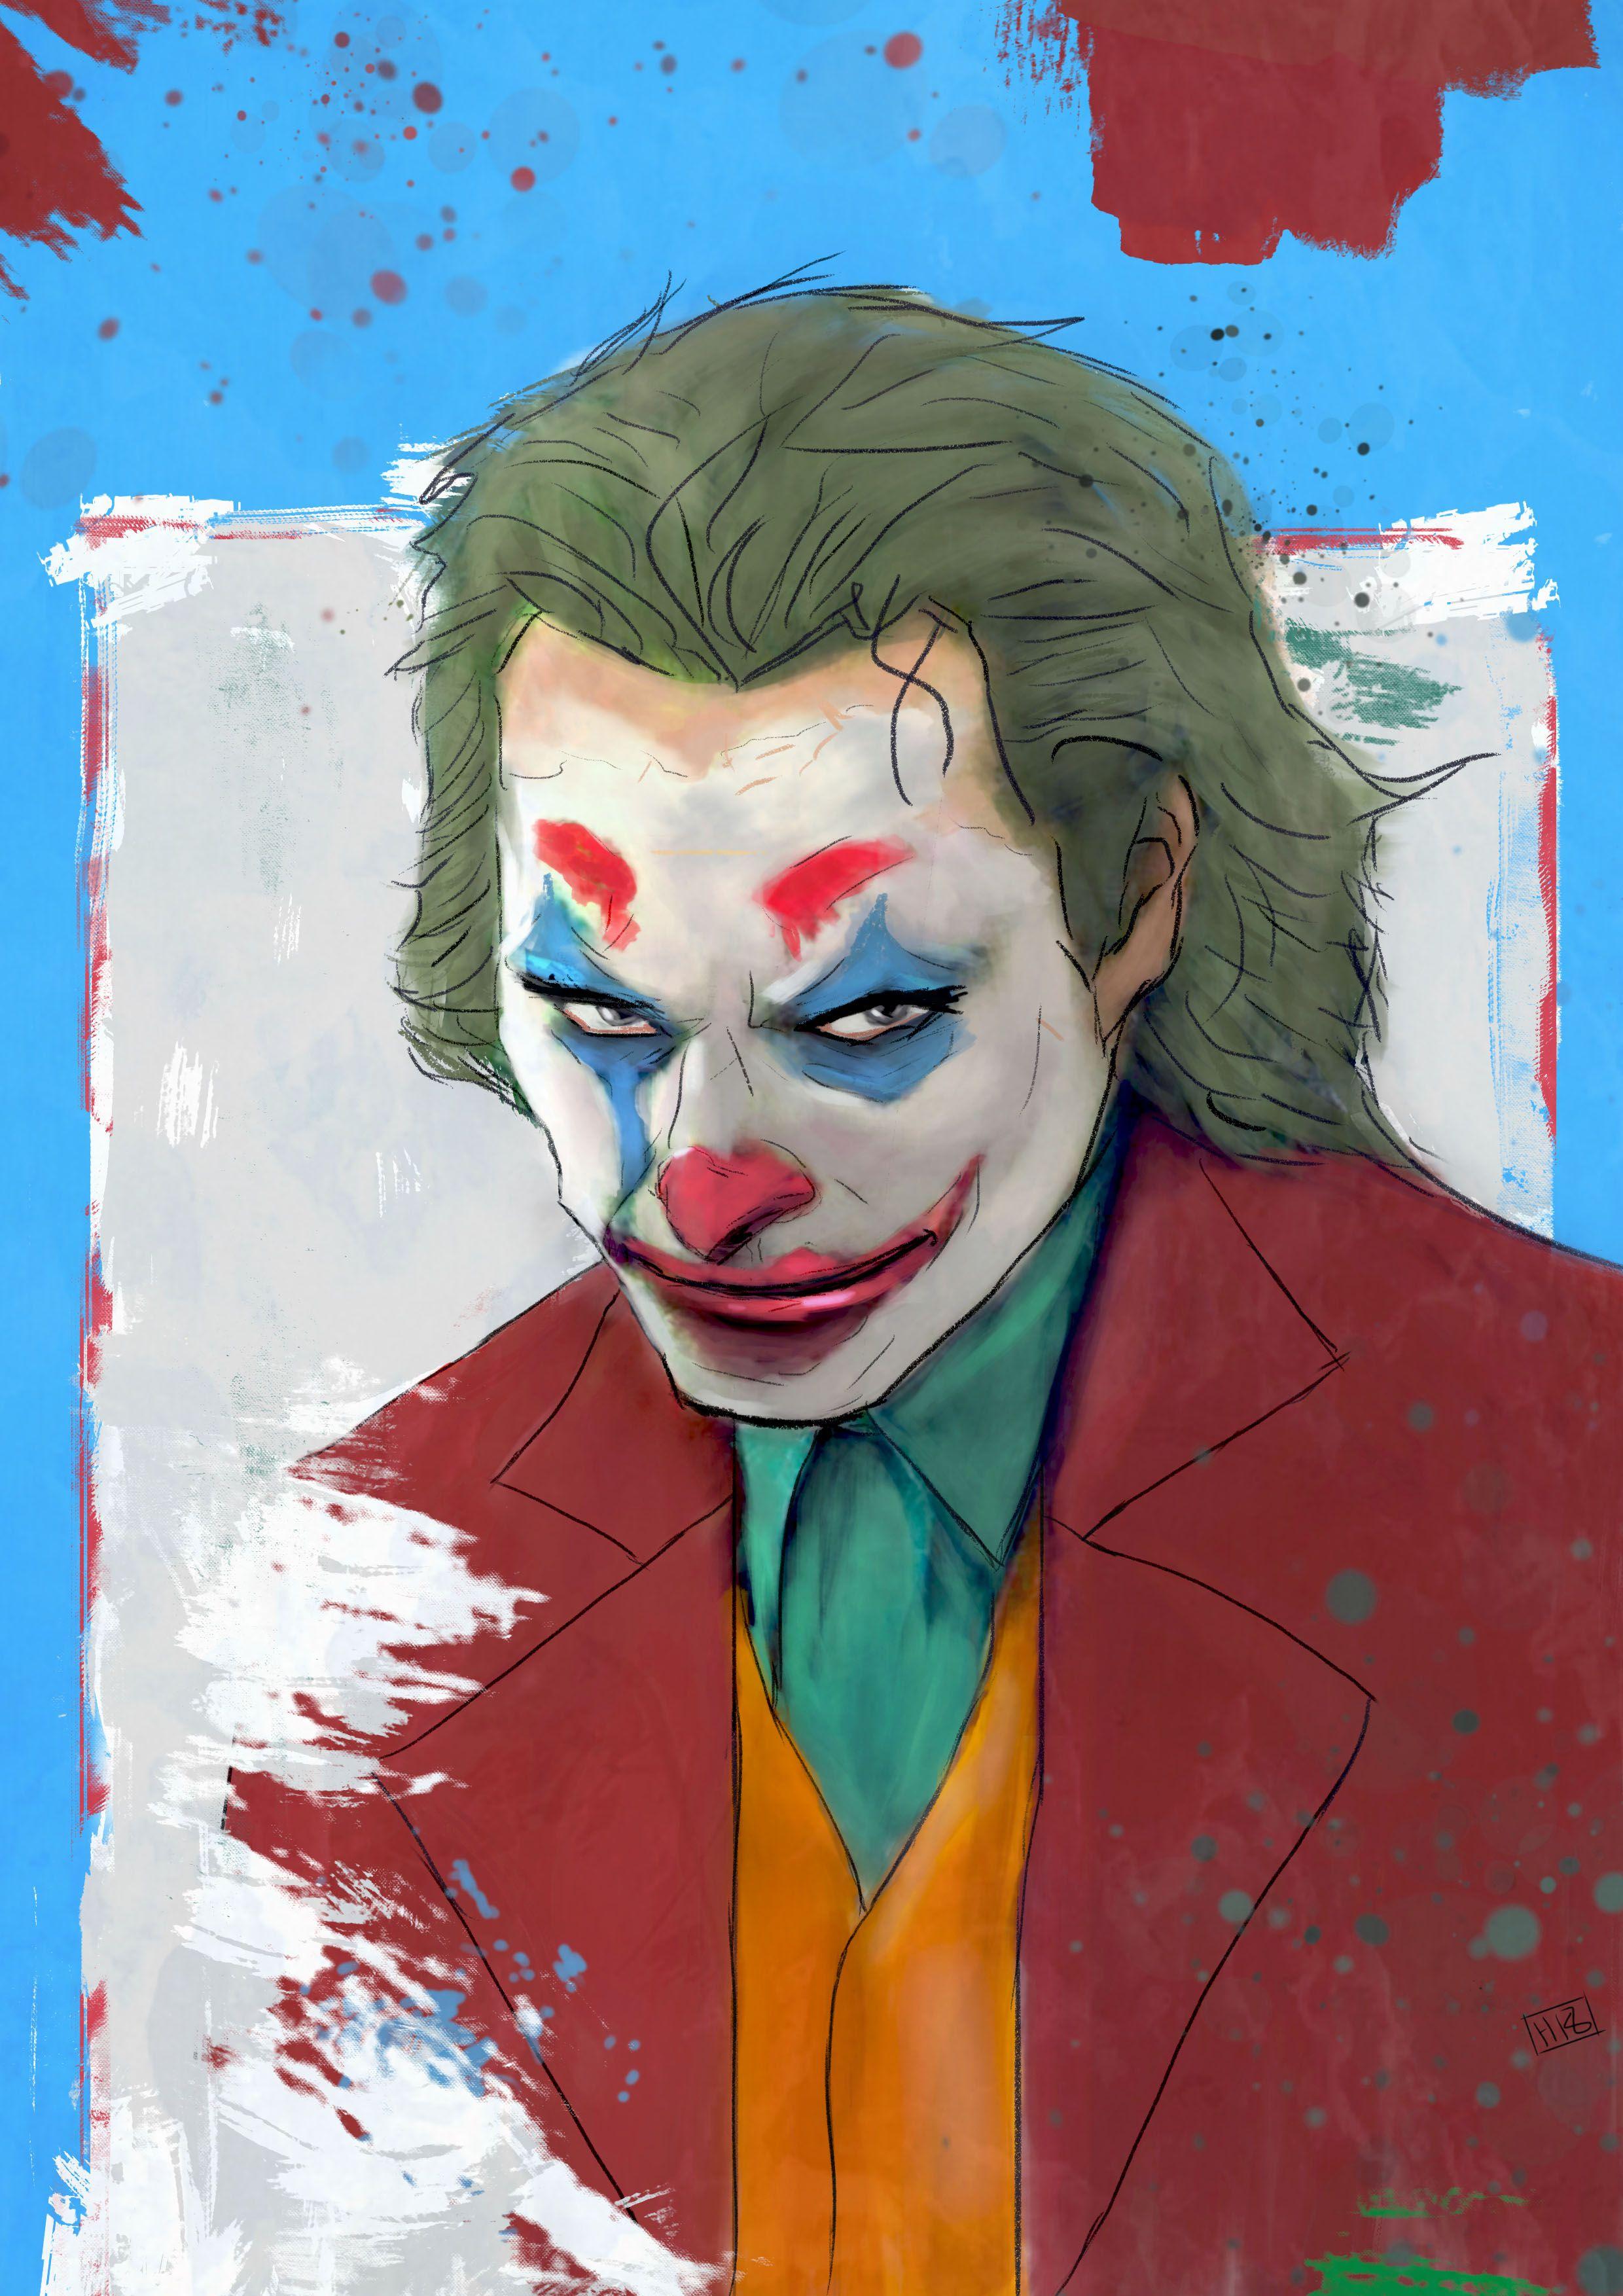 Joaquin Phoenix Joker Fanart Batman Comic Art Joker Art Joker